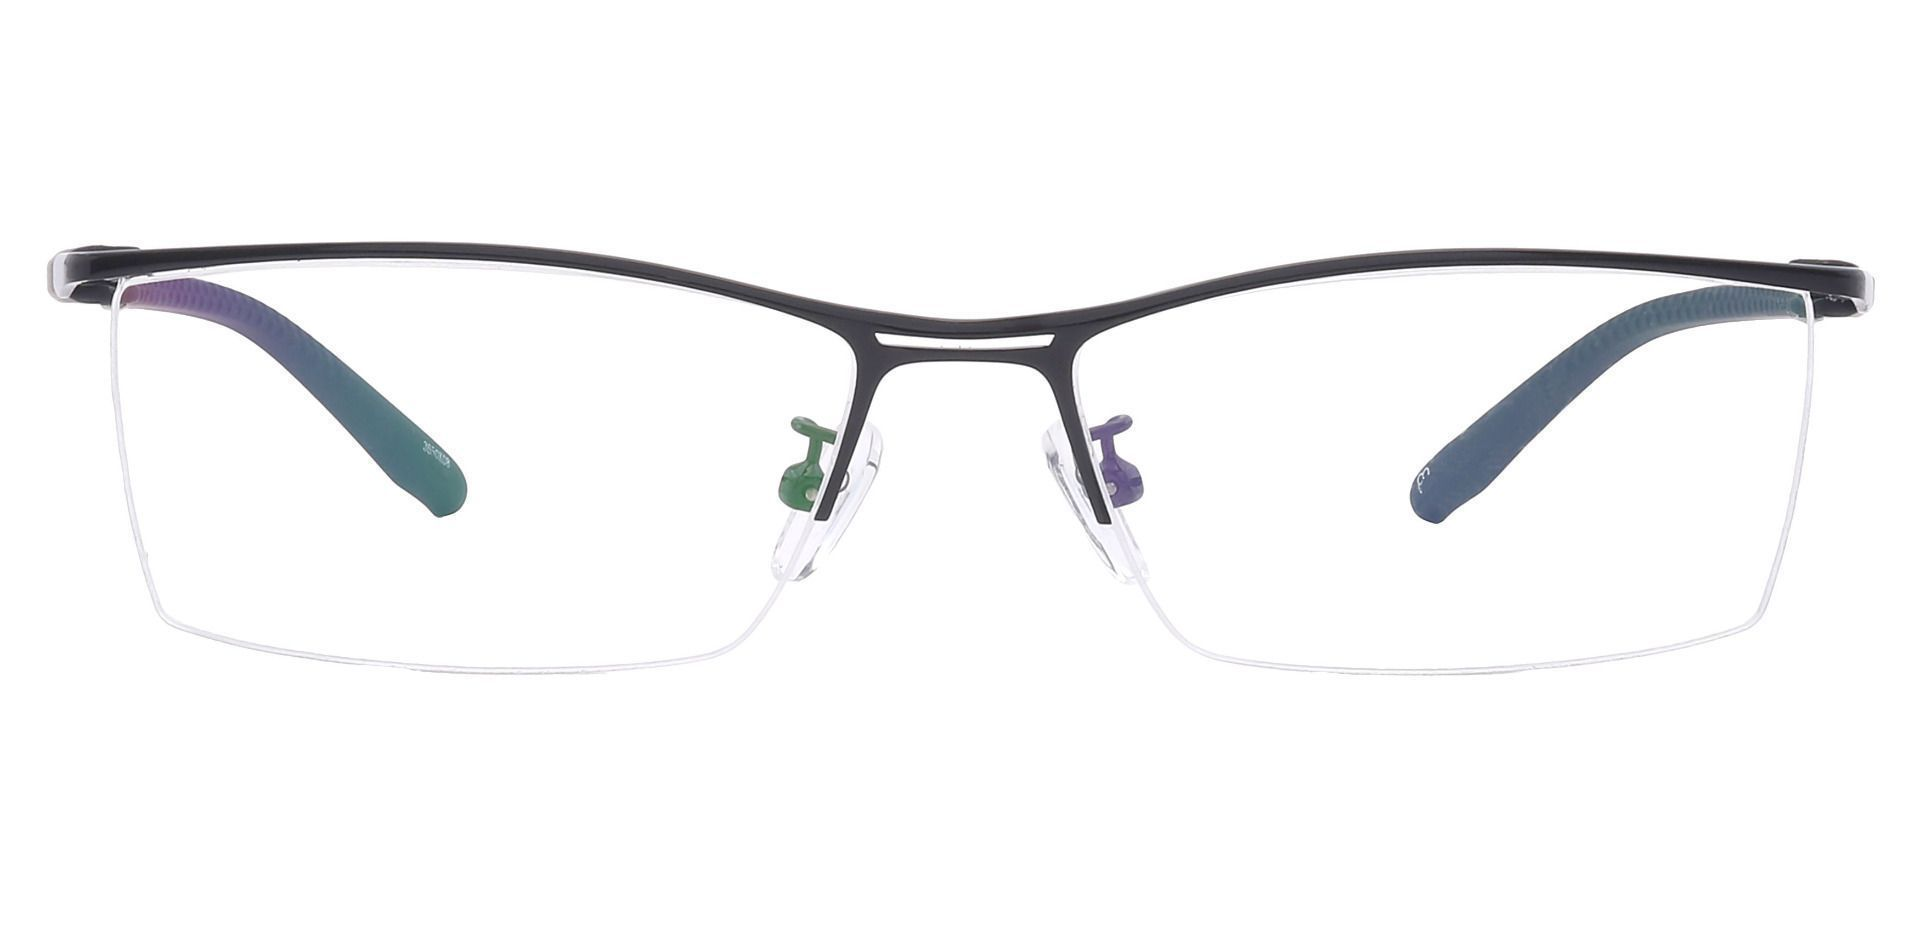 Taylor Rectangle Prescription Glasses - Black